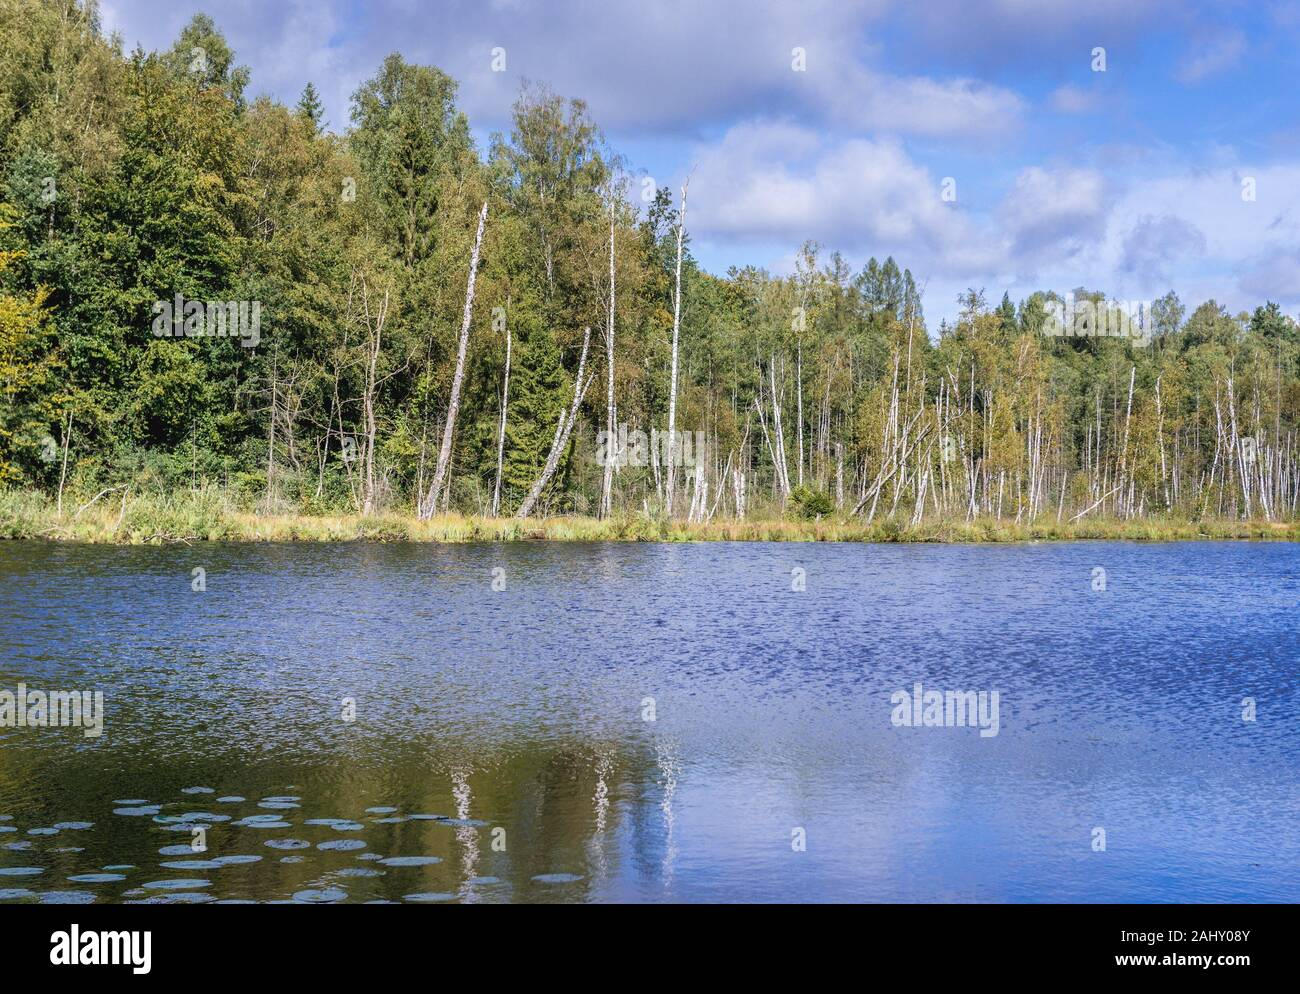 Vista sobre el lago Jezioro Francuskie (Francés) Reserva Natural Dylewo colinas parque paisajista, Ostroda County en Polonia. Foto de stock